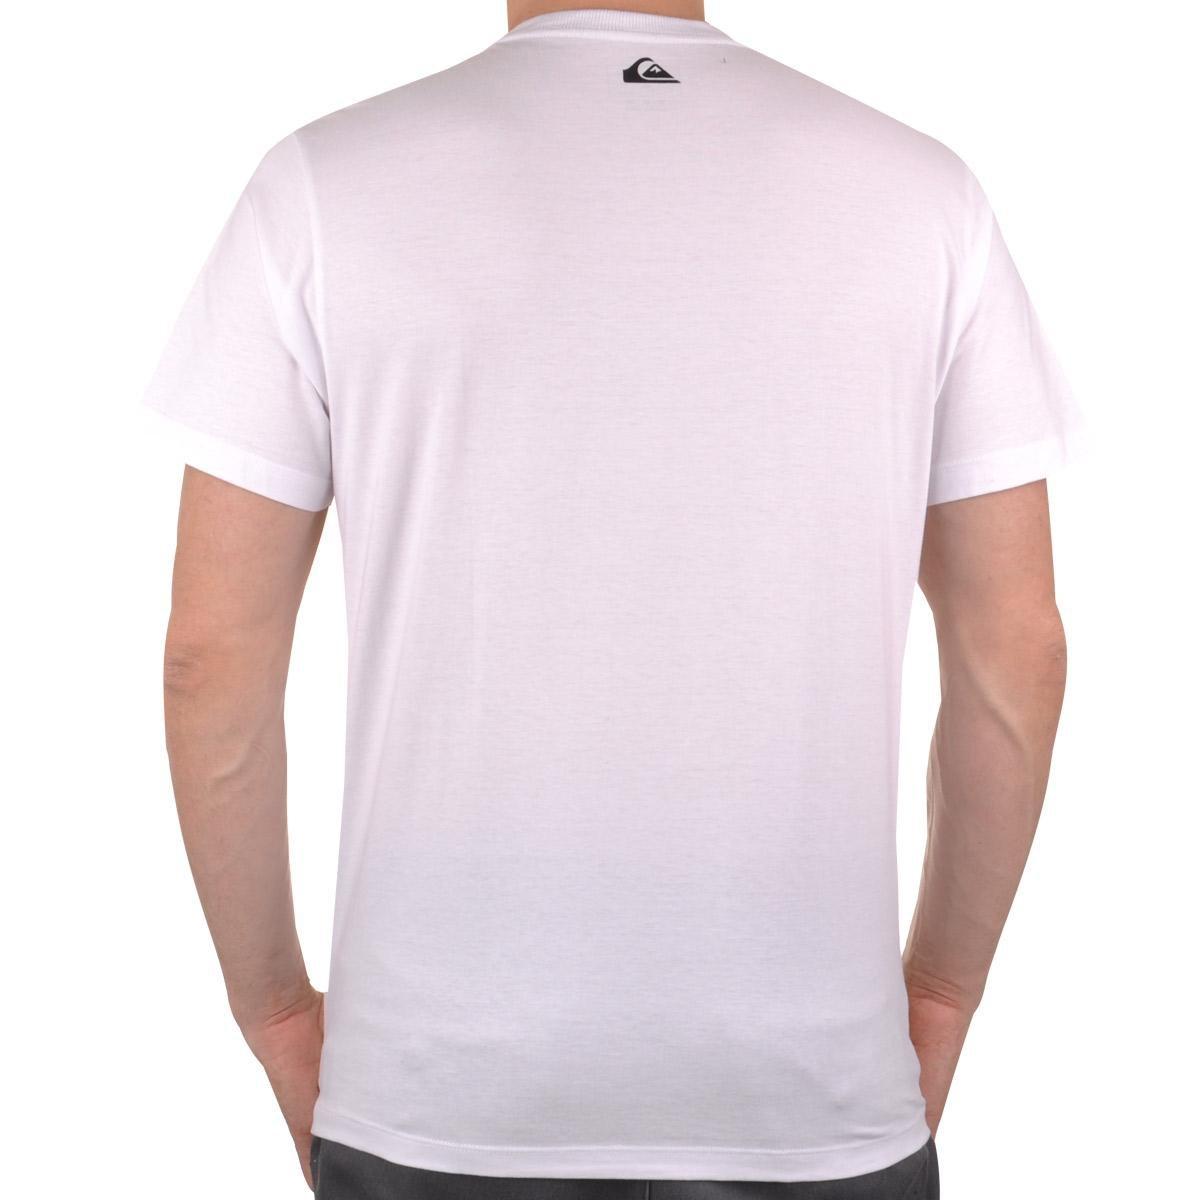 Camiseta Hurray Monkey Quiksilver Branco Camiseta Masculino Quiksilver Uxq6zwU